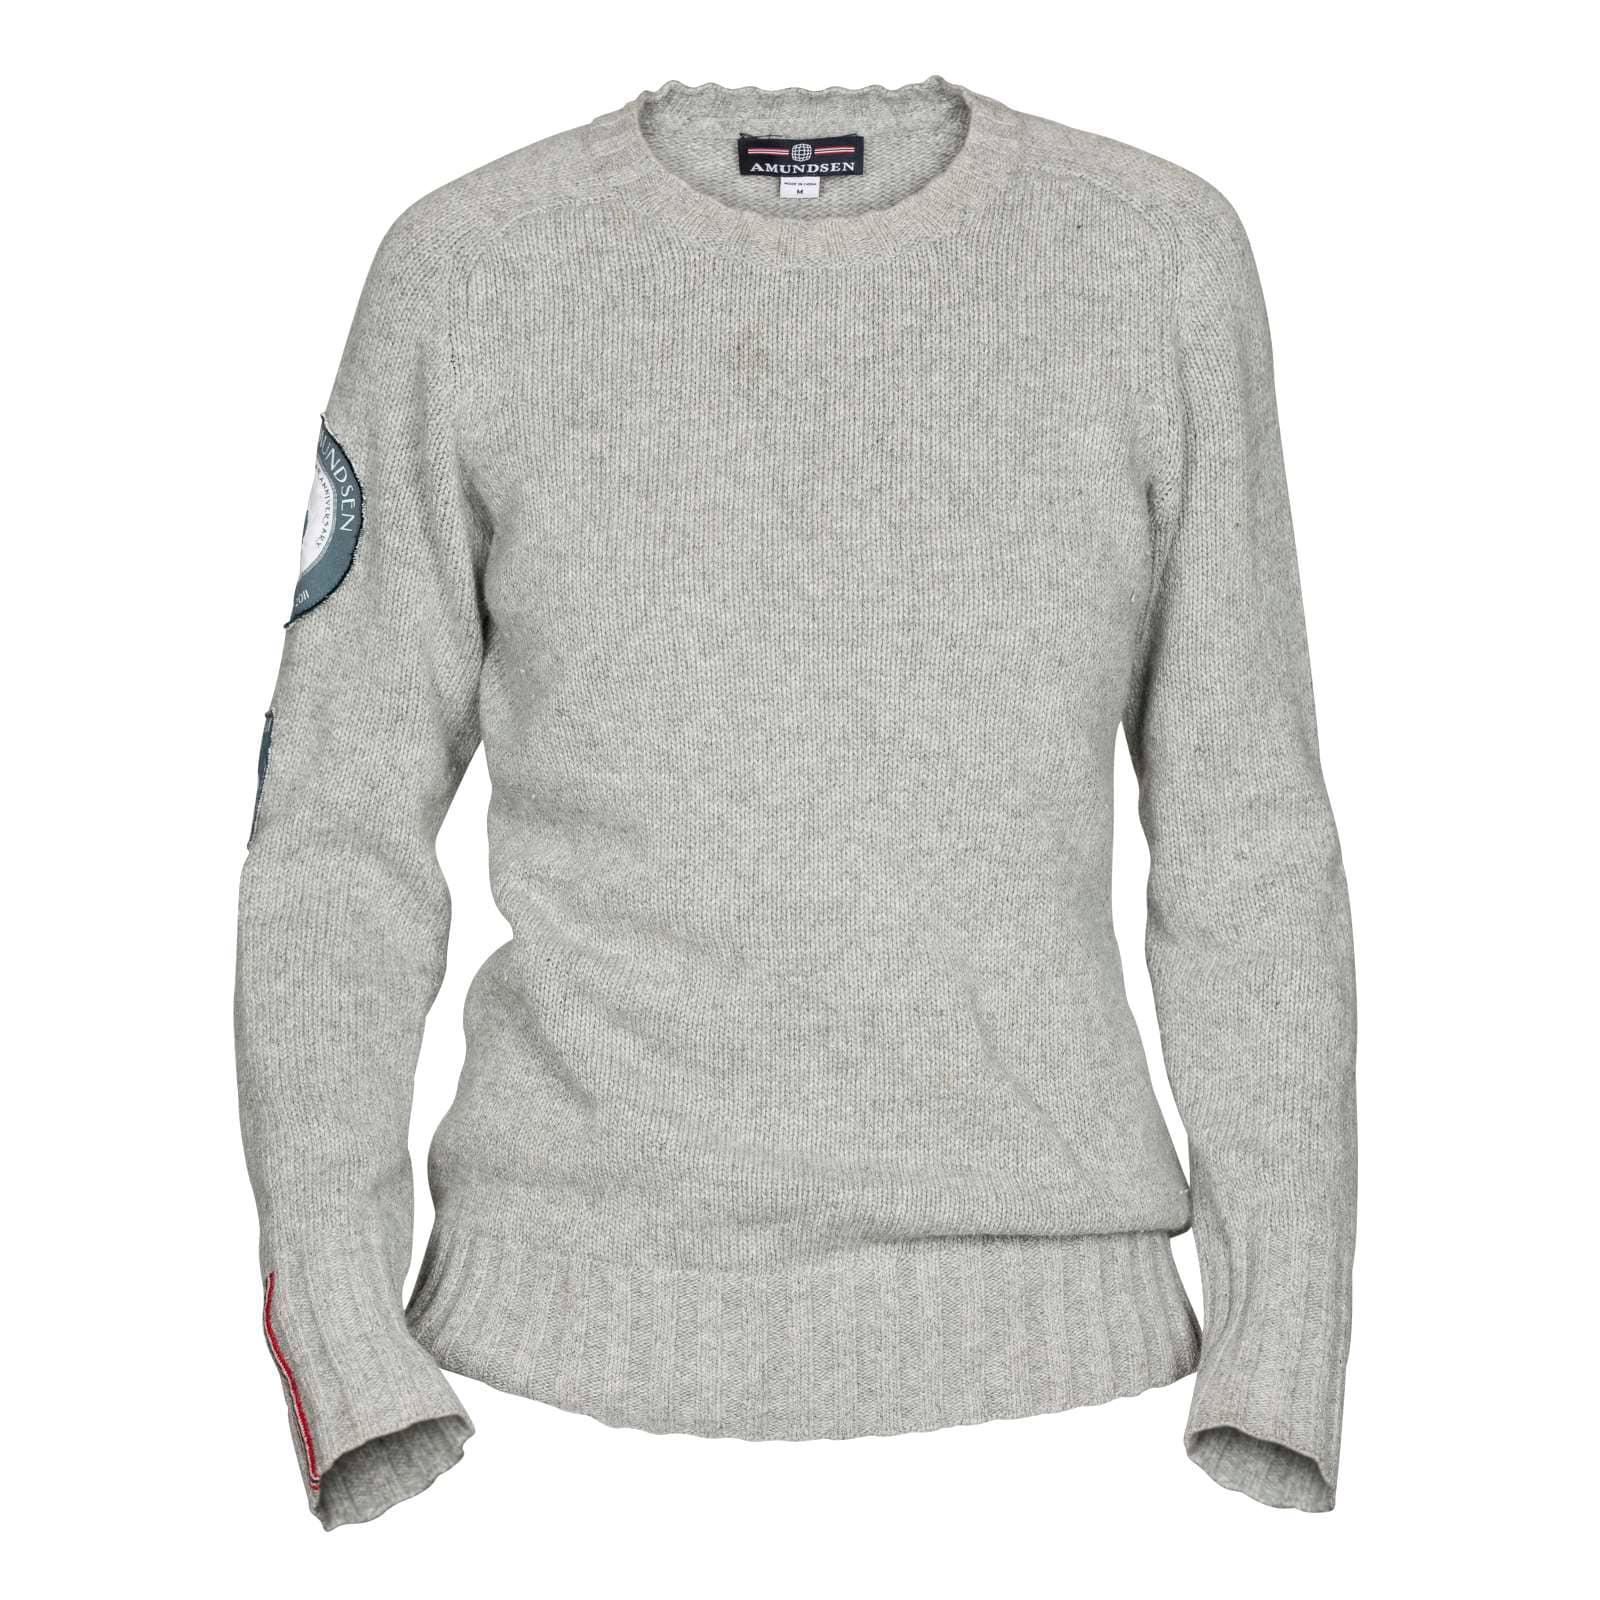 Amundsen genser | FINN.no